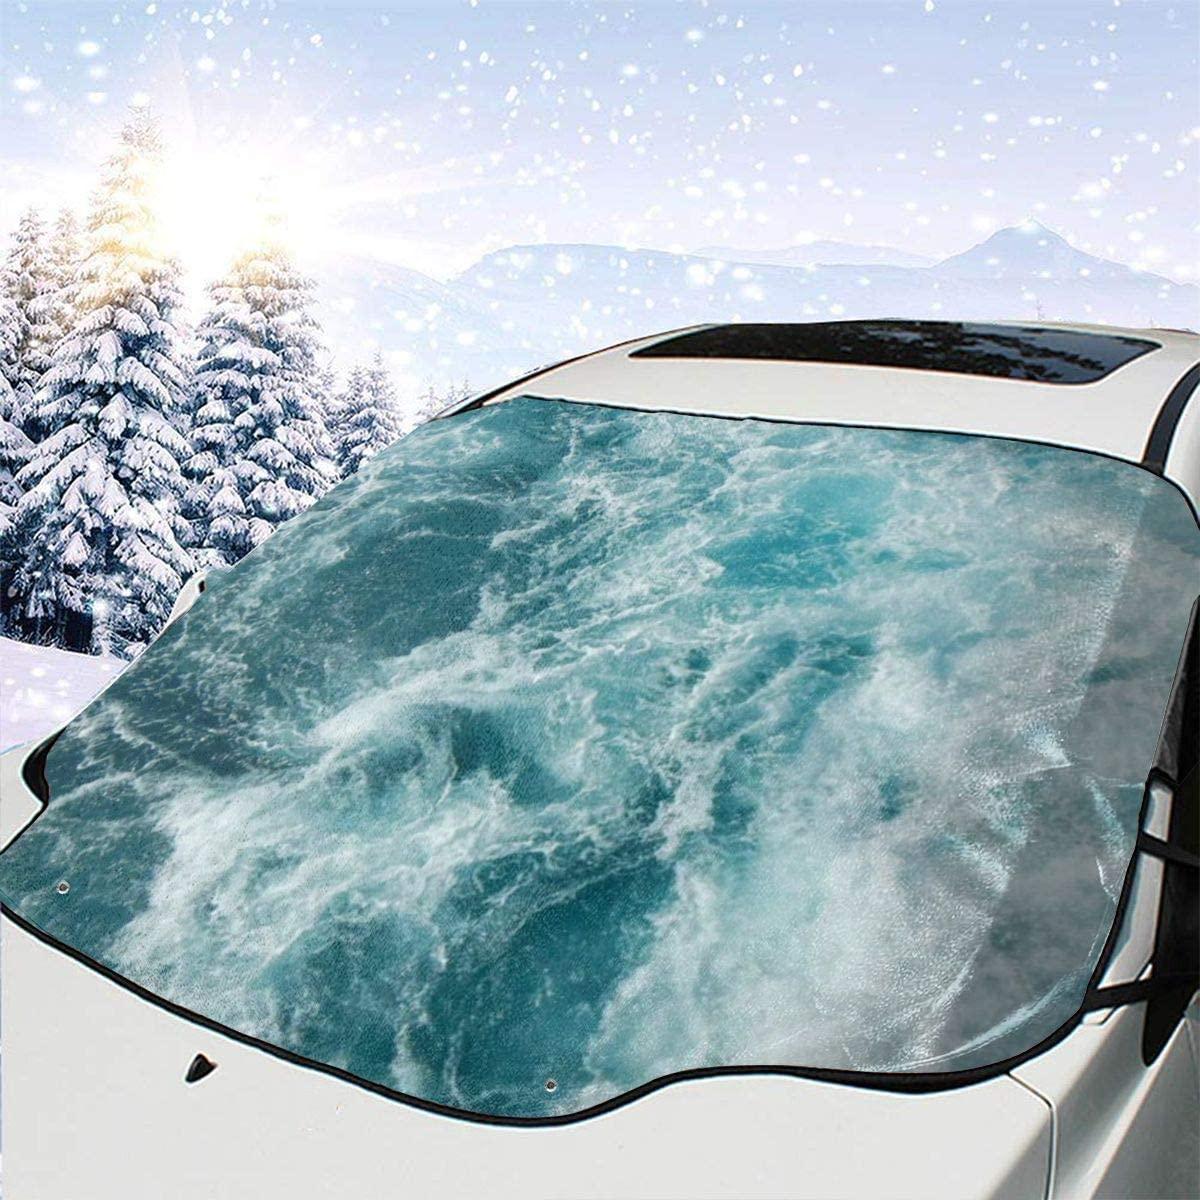 THONFIRE Car Front Window Windshield Winter Sun Shade Ocean Water Cover Sand Proof Blocks Heat Damage Free Visor Protector Trucks Autumn Heat Reflector